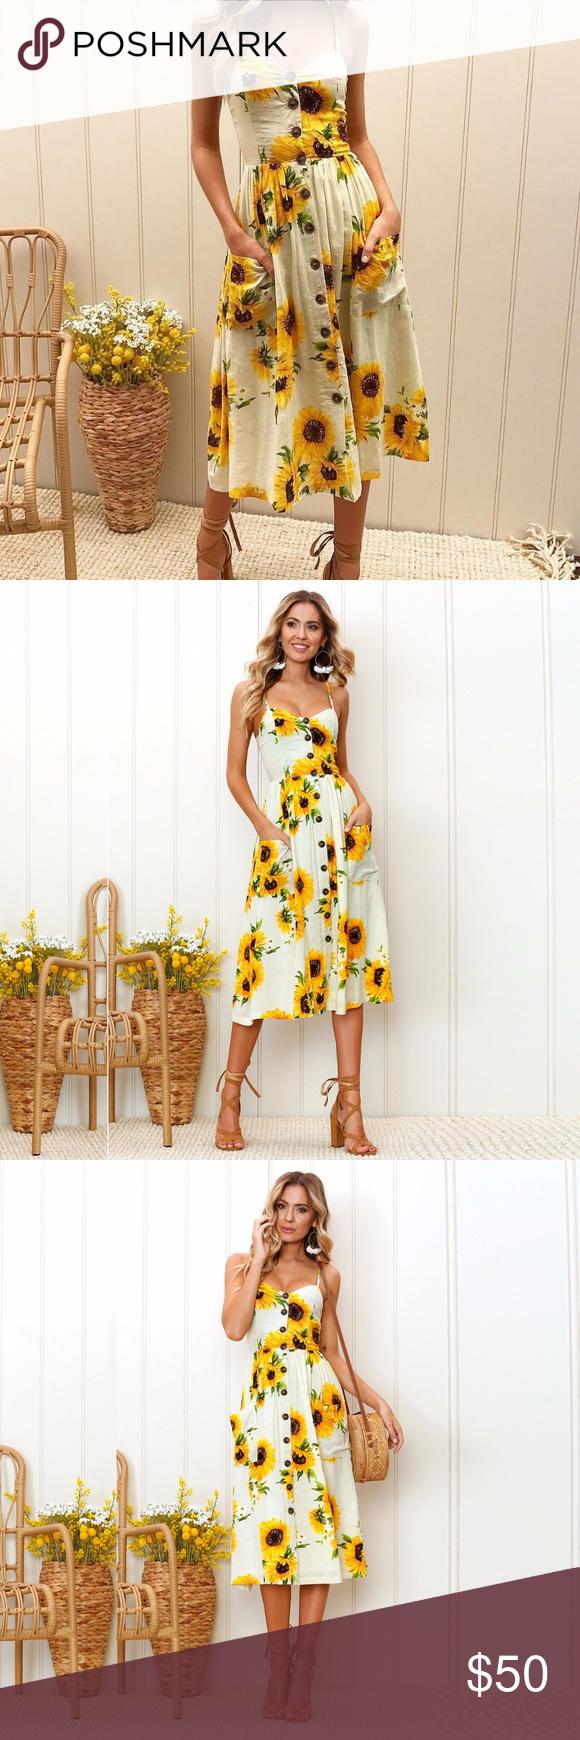 Ivory Sunflower Button Down Dress Printed Summer Dresses Boutique Dresses Clothes Design [ 1740 x 580 Pixel ]